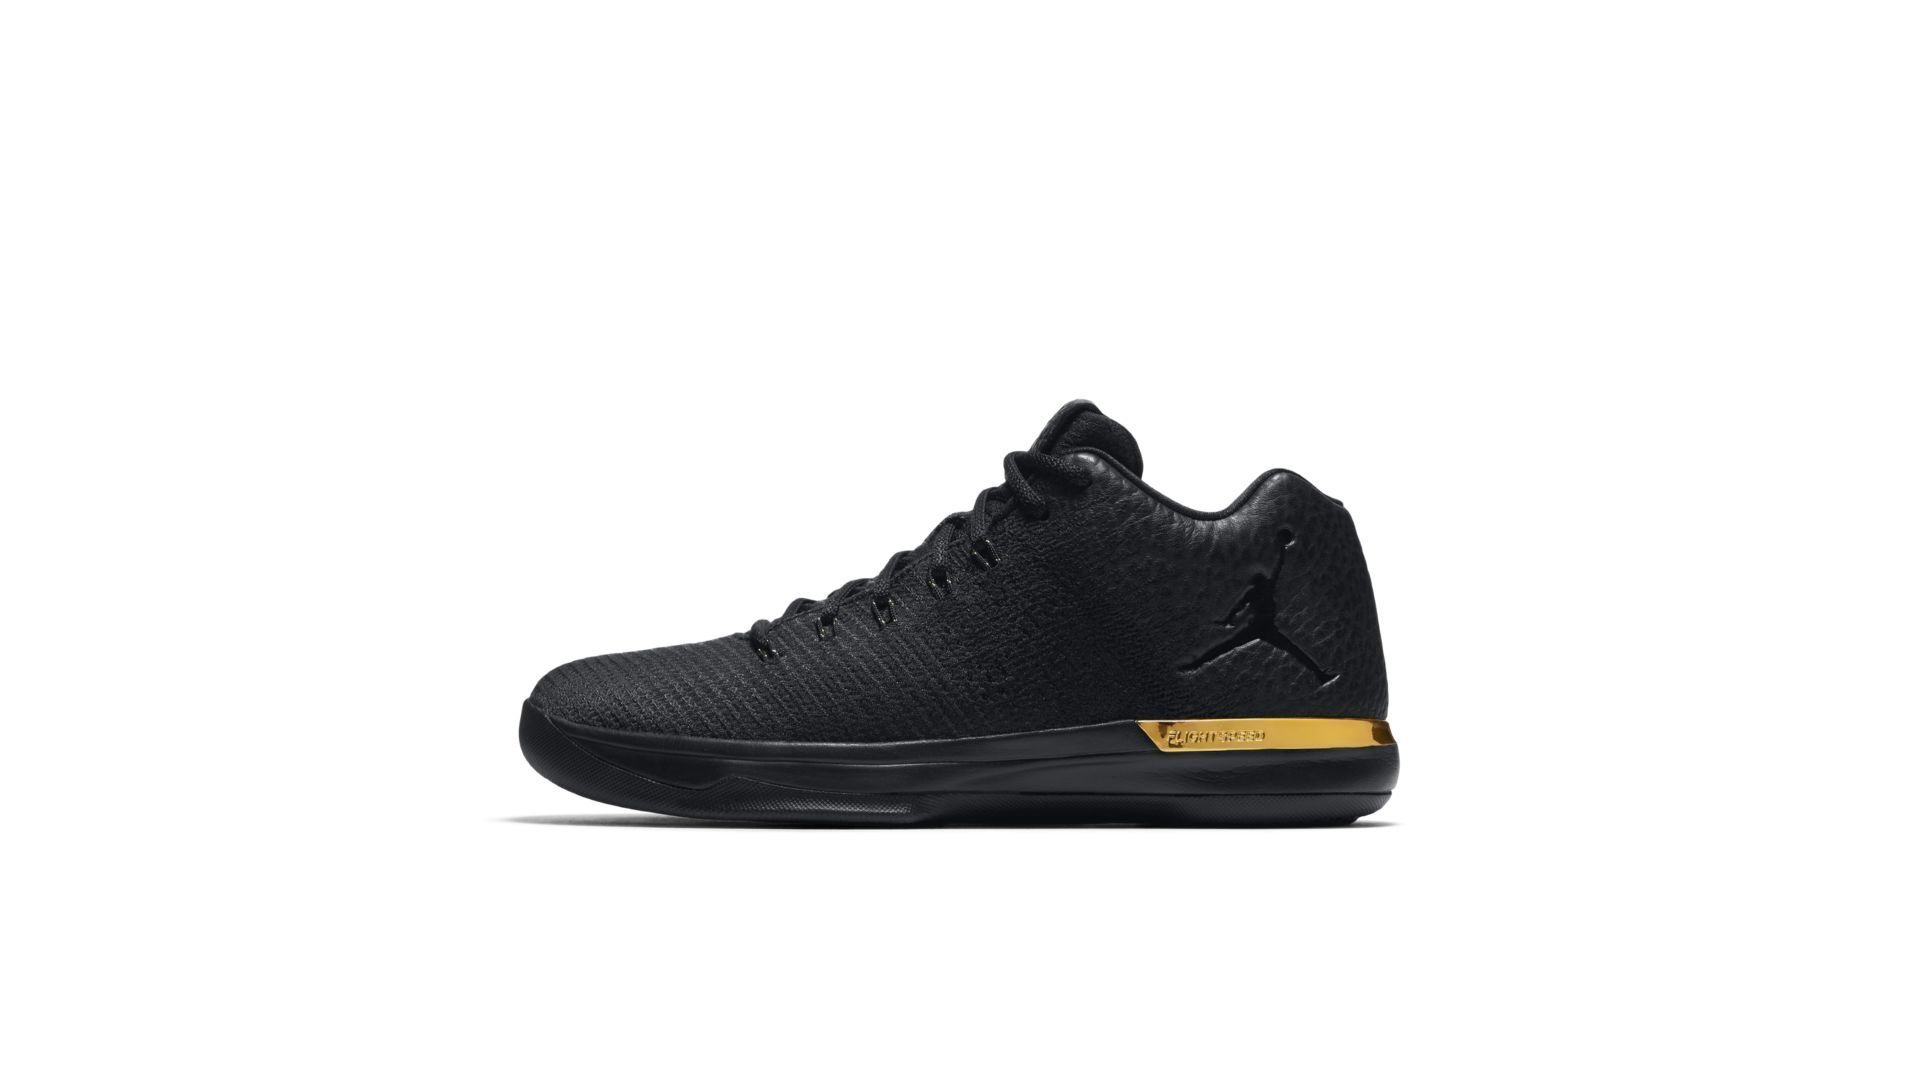 Jordan XXX1 Low Black Gold (897564-023)